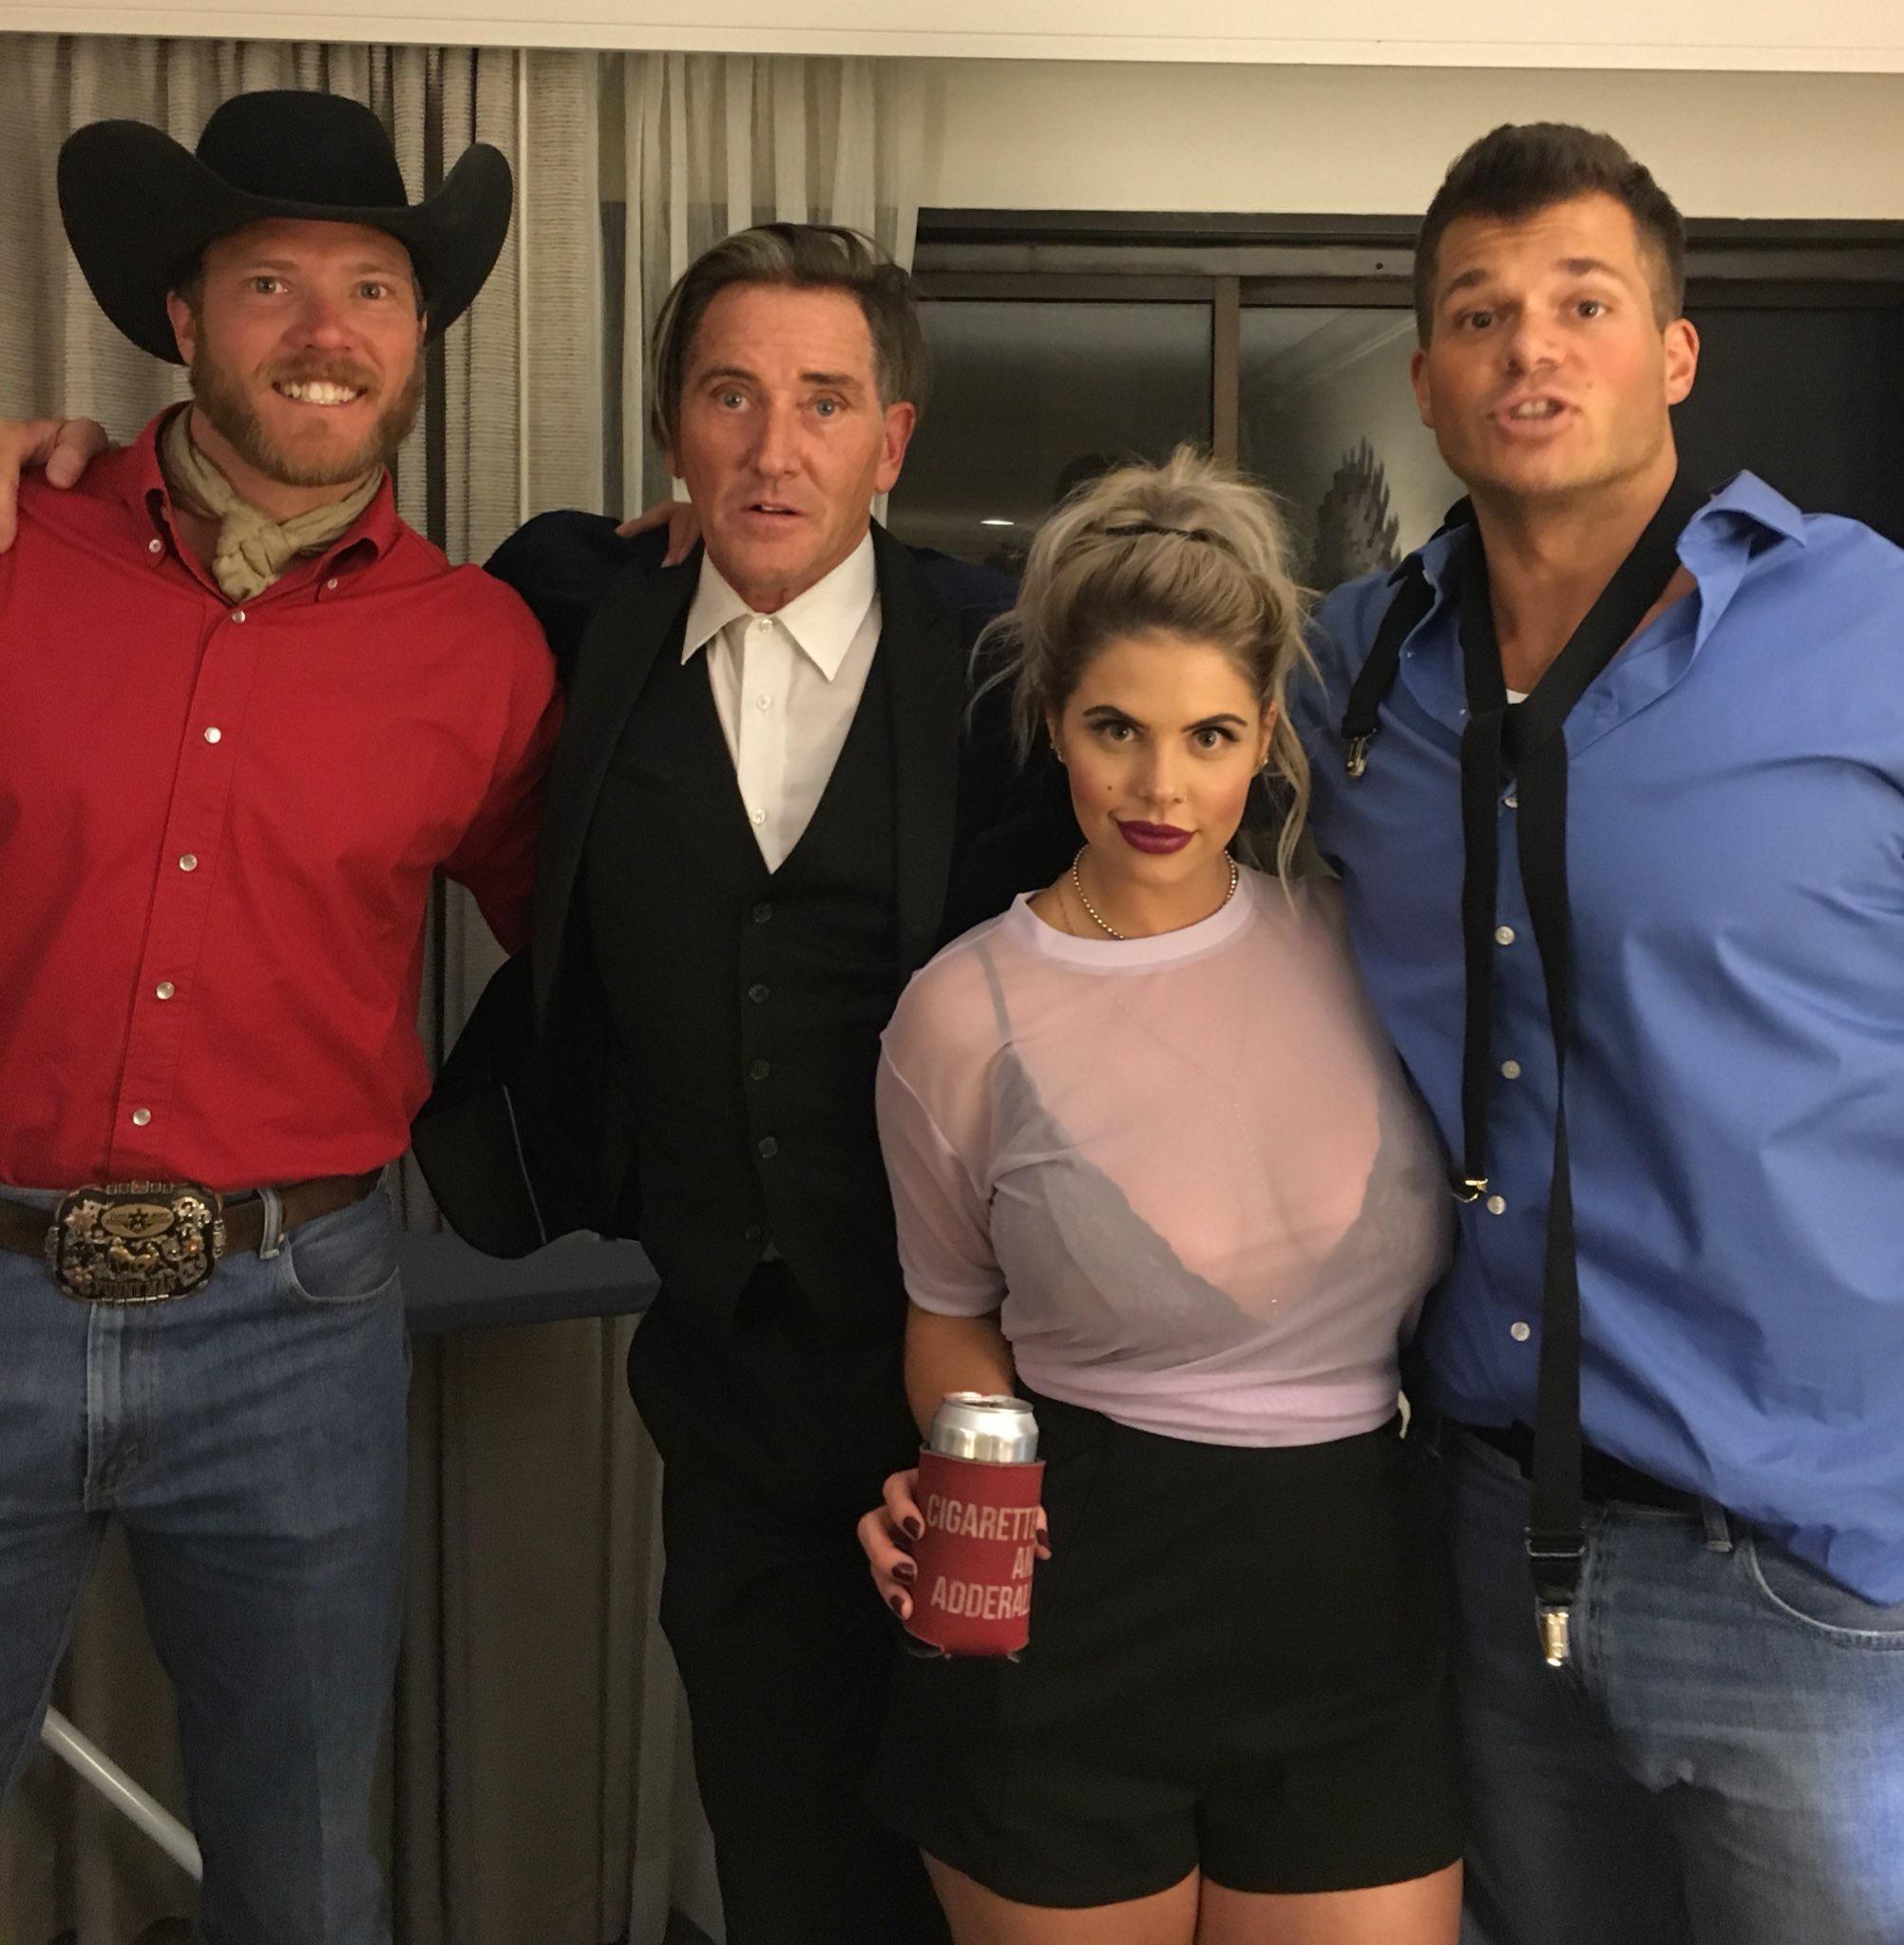 Big Brother 19 Mark Jansen, Elena Davies, Kevin Schlehuber, and Jason Dent